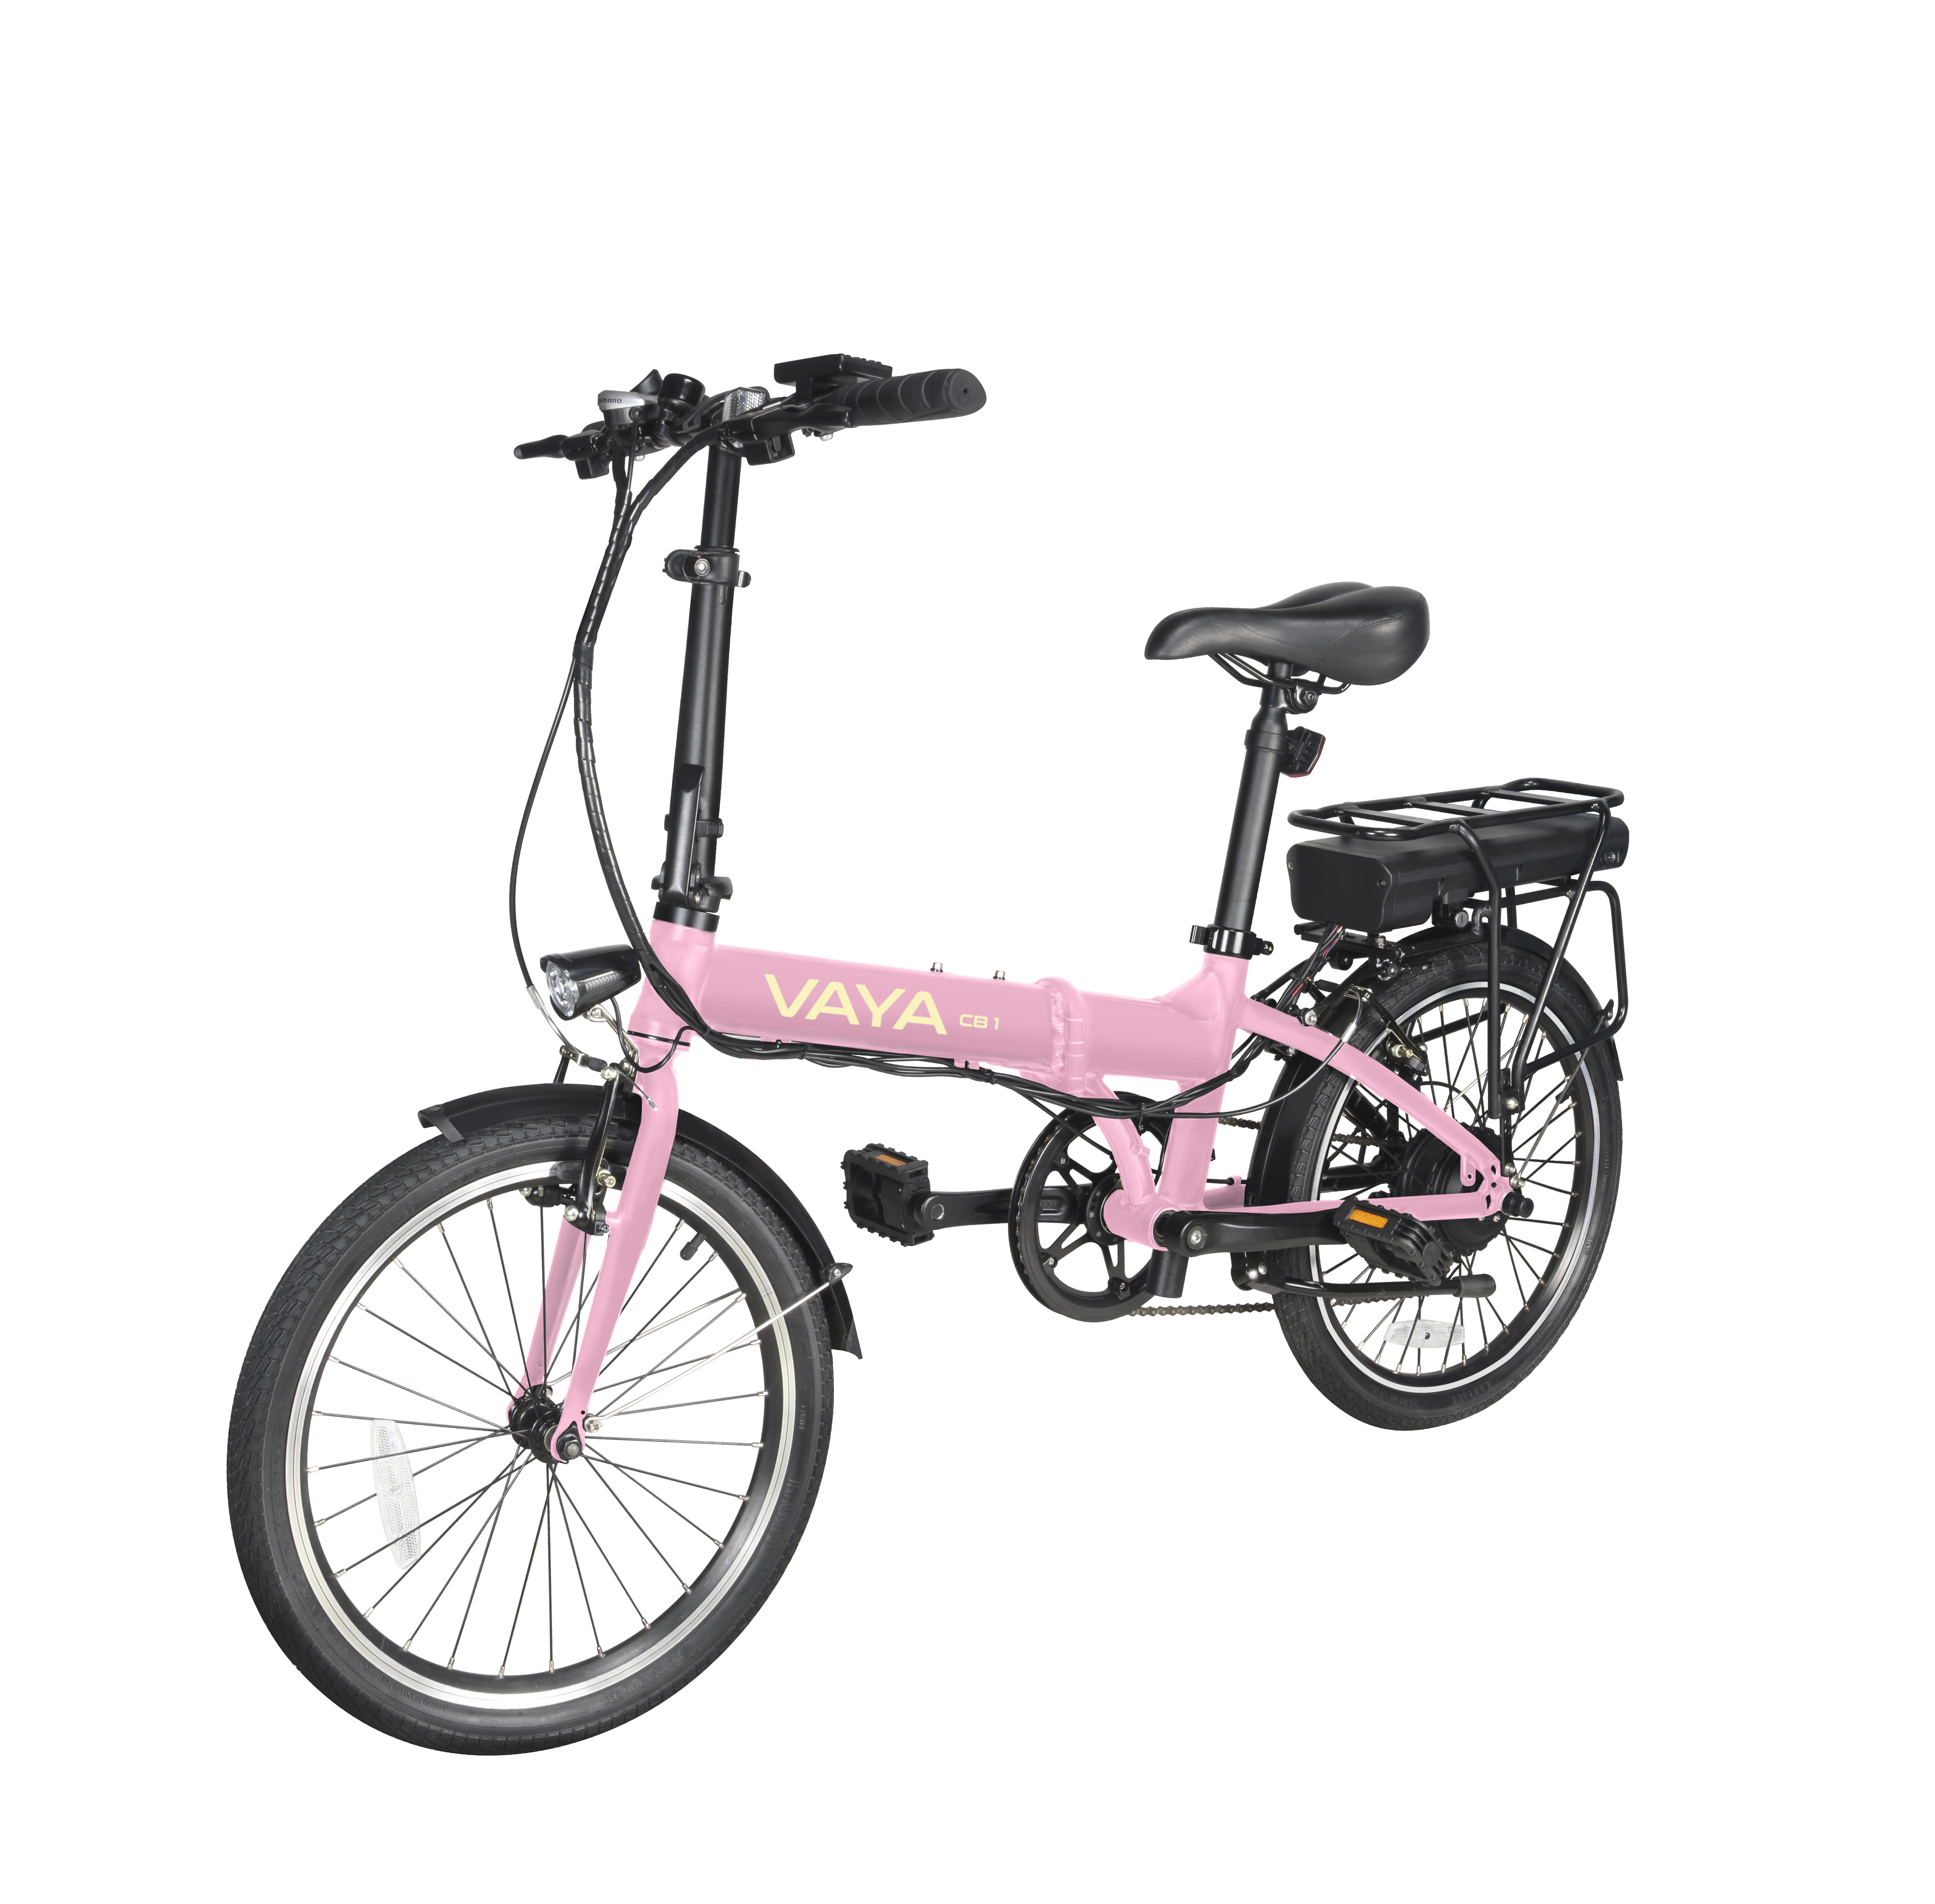 Vaya - CB-1 Electric City Bike - Flamingo (1641FL)